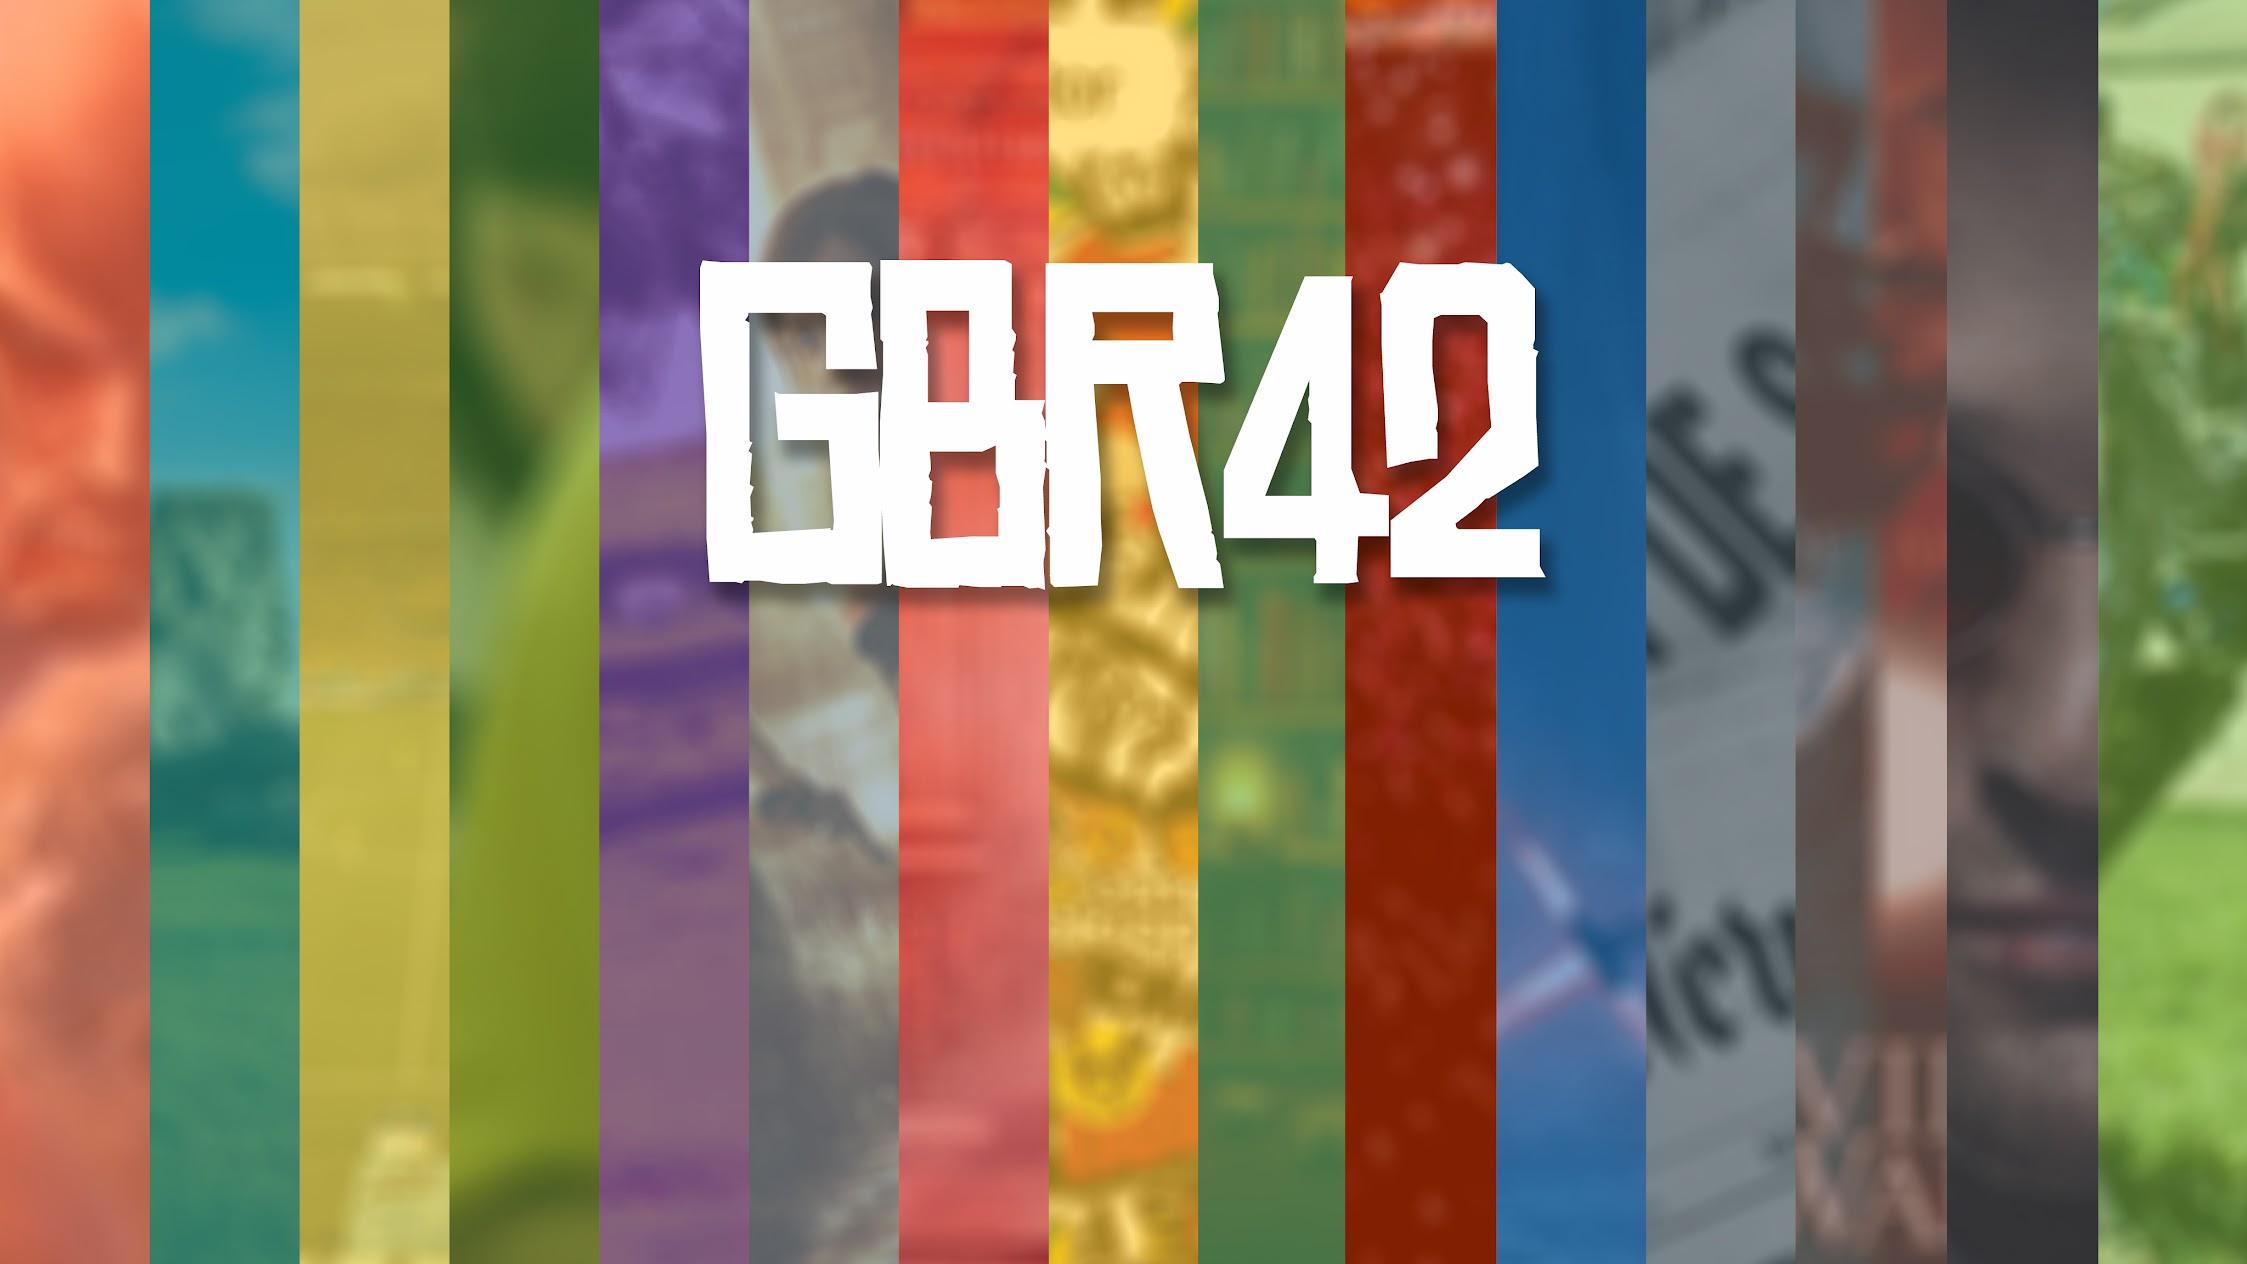 GBR42